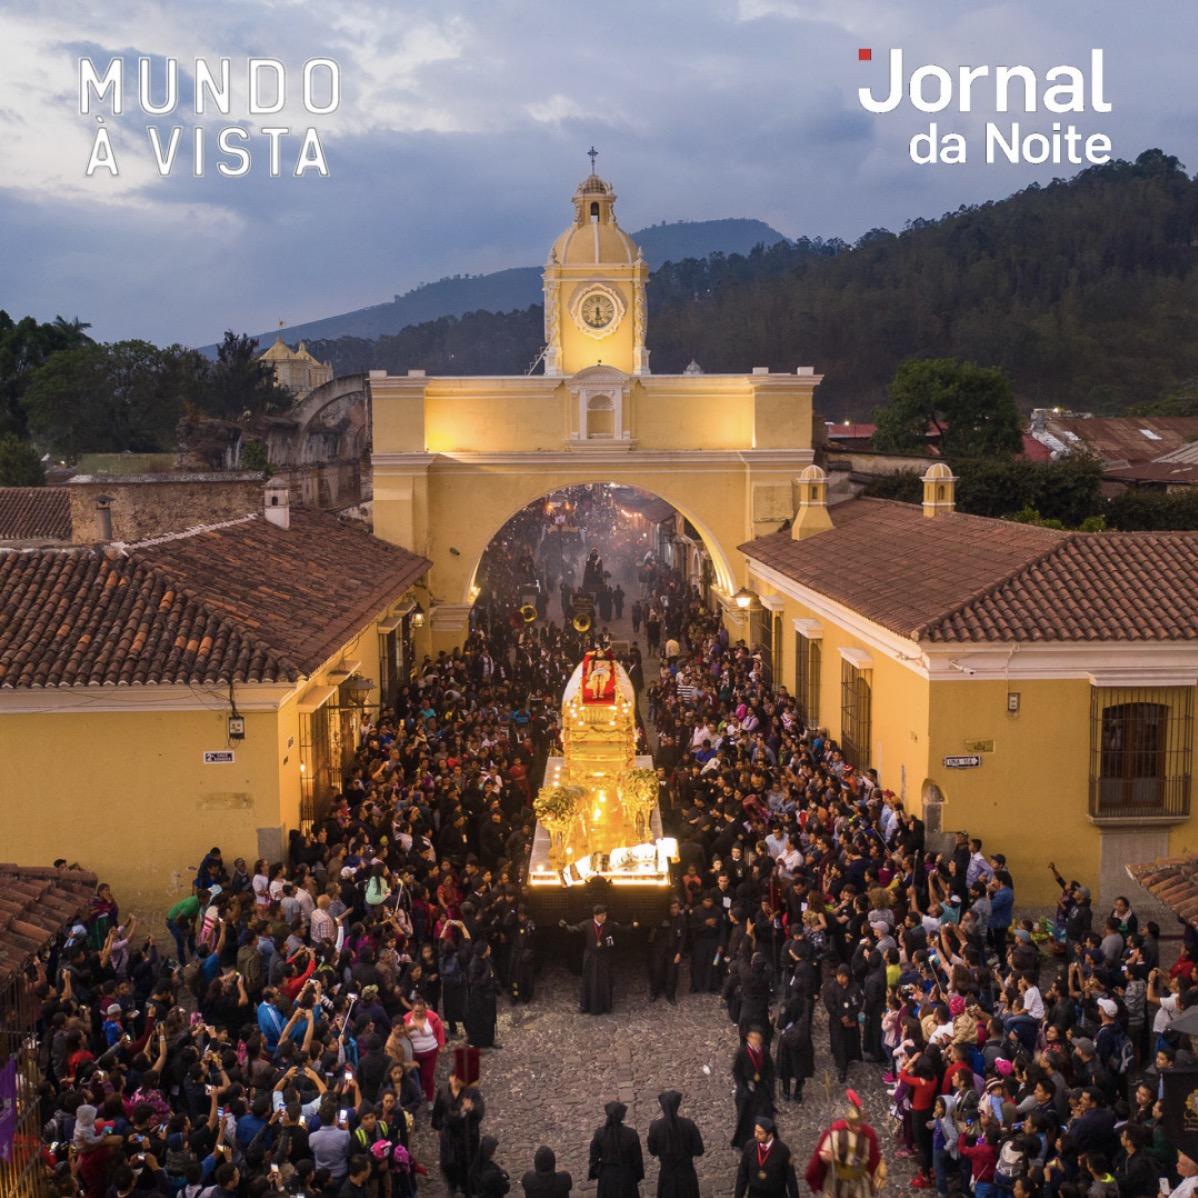 Mundo-a-vista-joel-santos-jornal-da-noite-sic-noticias-guatemala-antigua.jpg